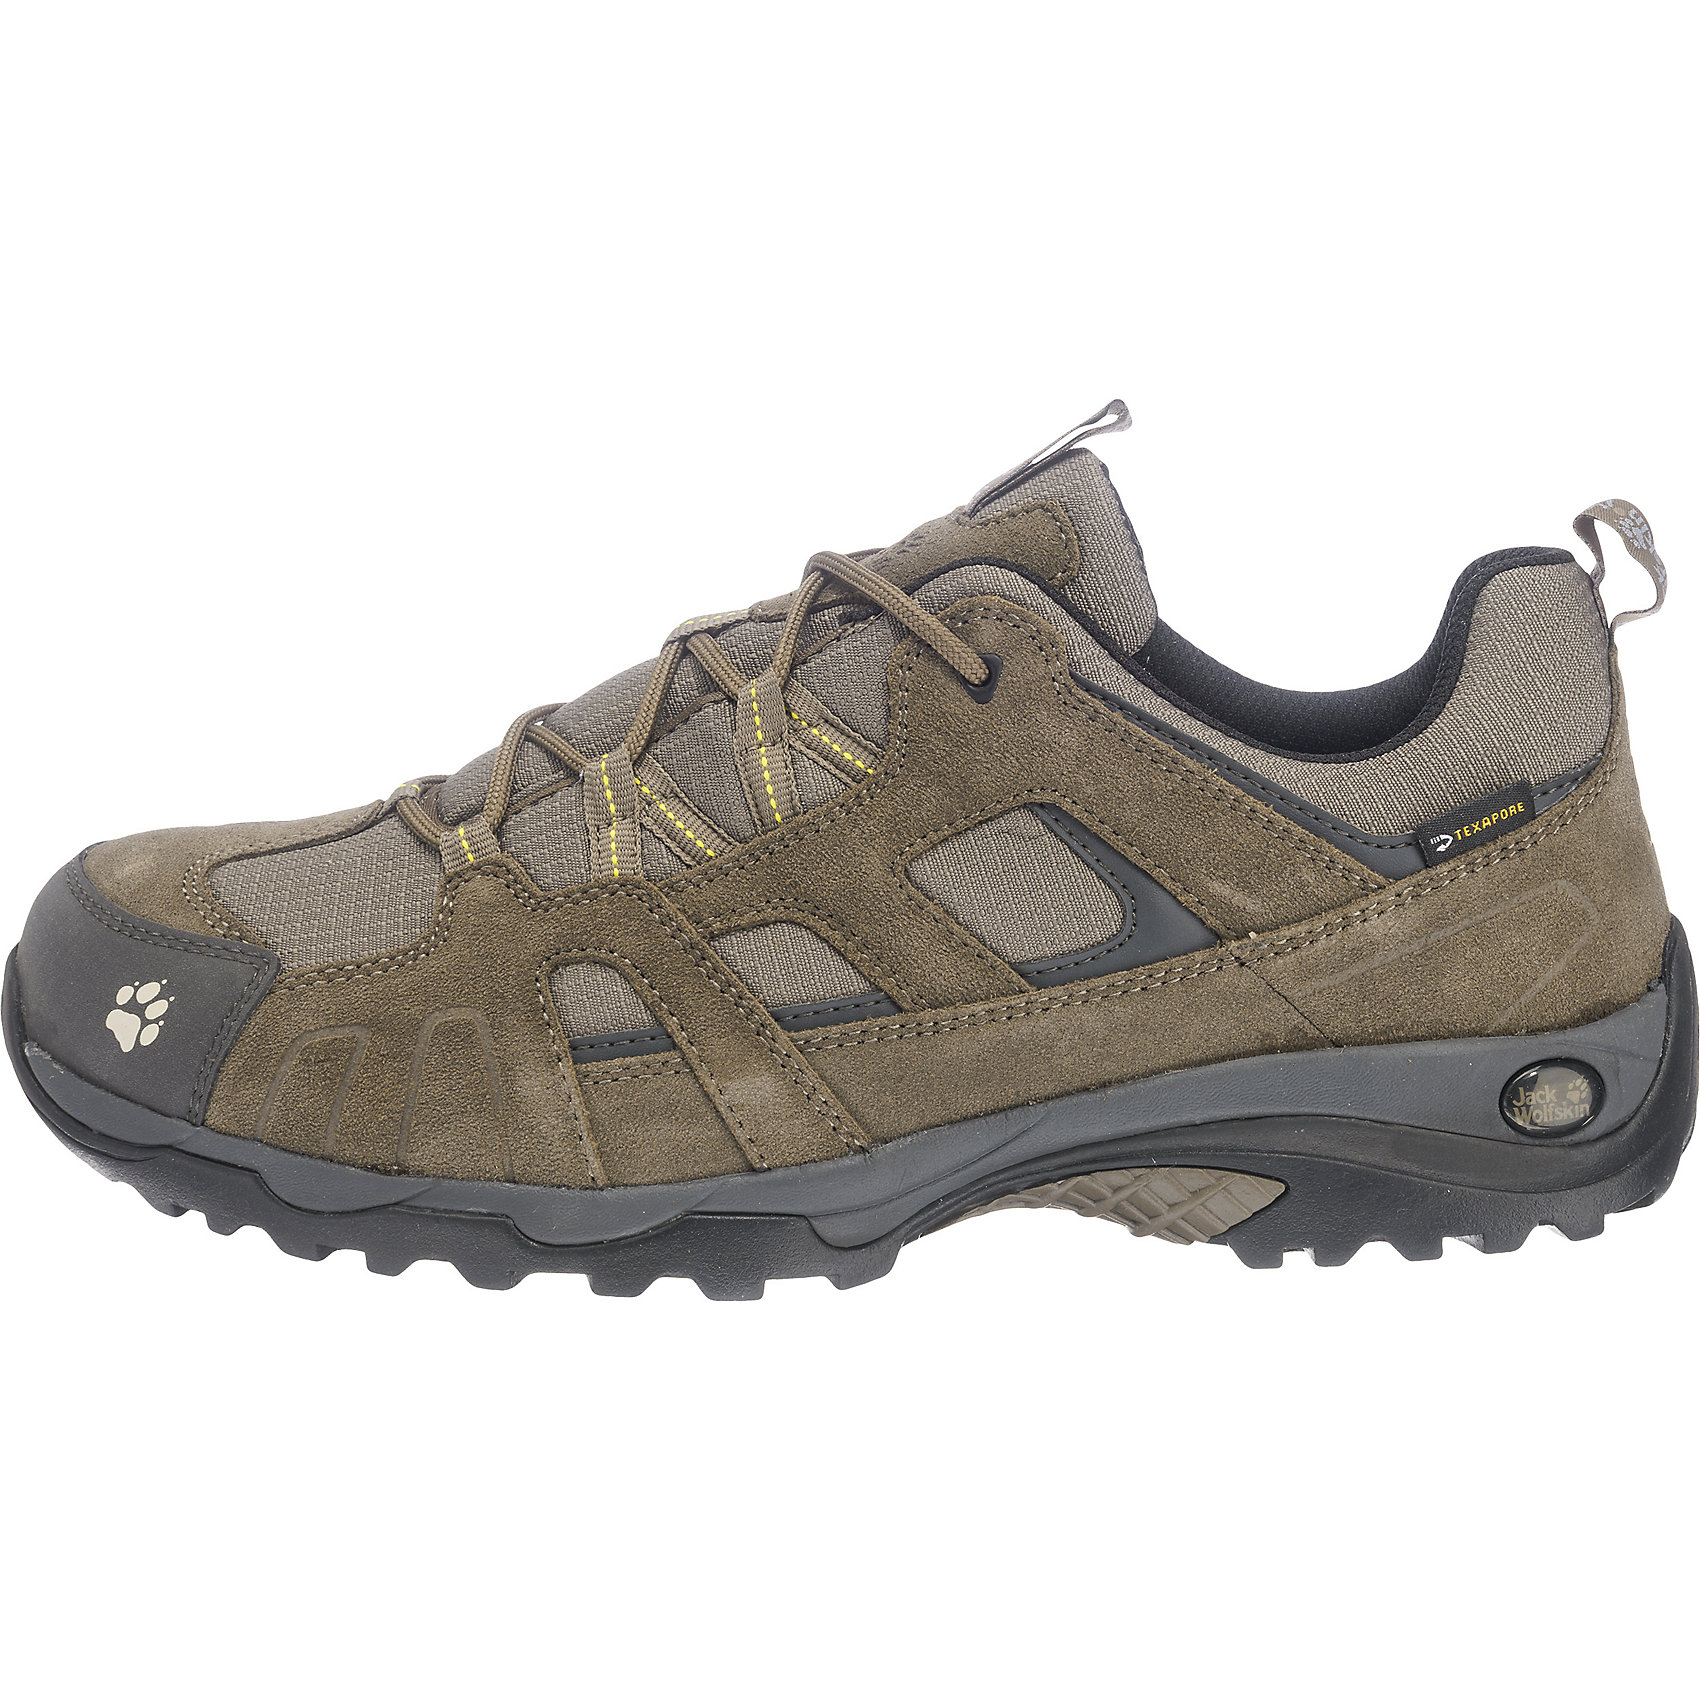 Details zu Neu JACK WOLFSKIN Vojo Hike Texapore Freizeit Schuhe schwarz kombi khaki 5742109